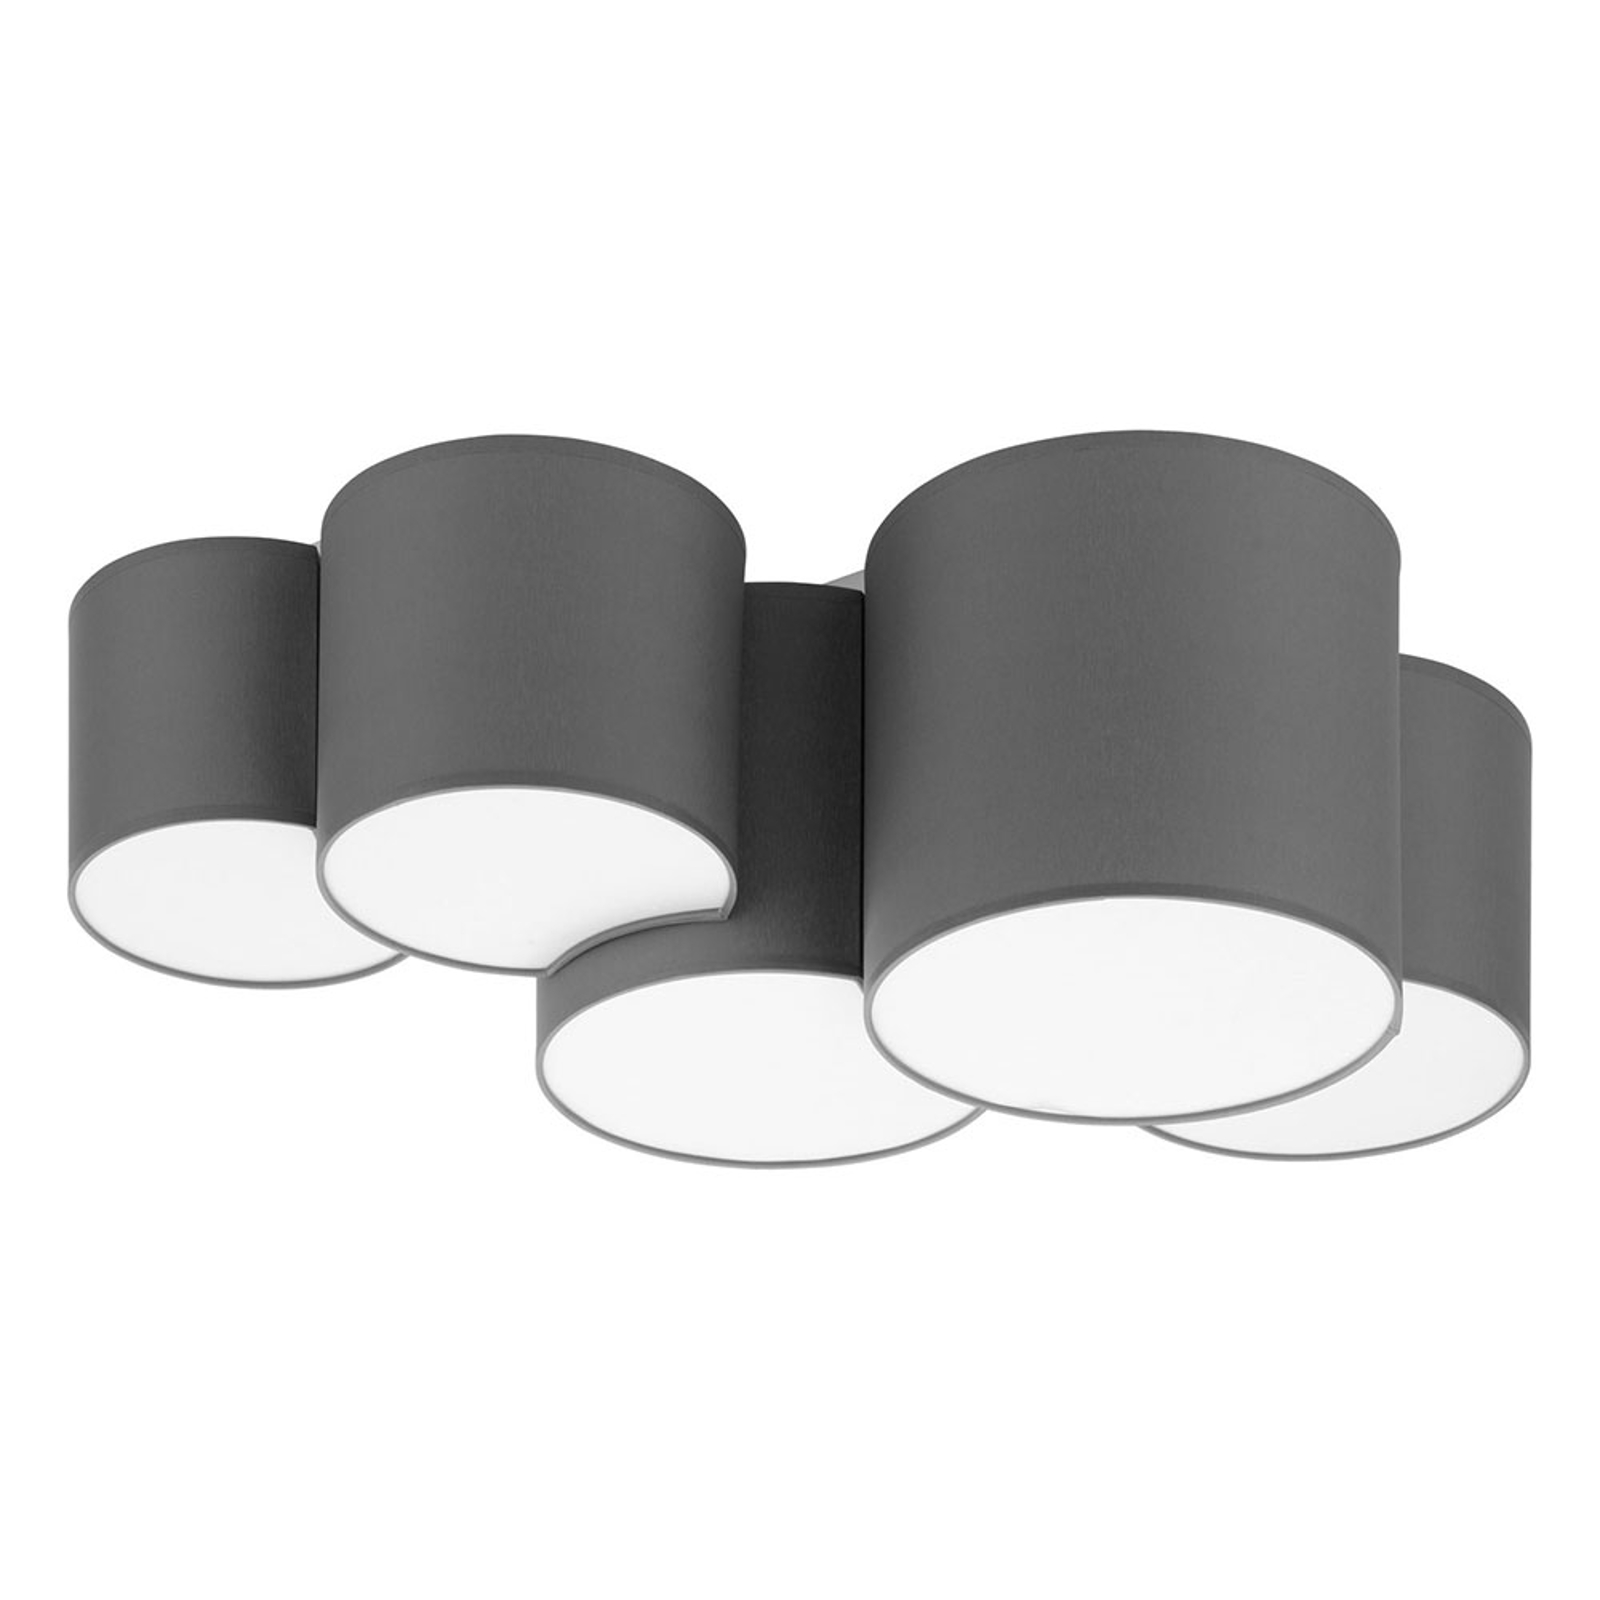 Taklampe Mona, fem lyskilder, grå